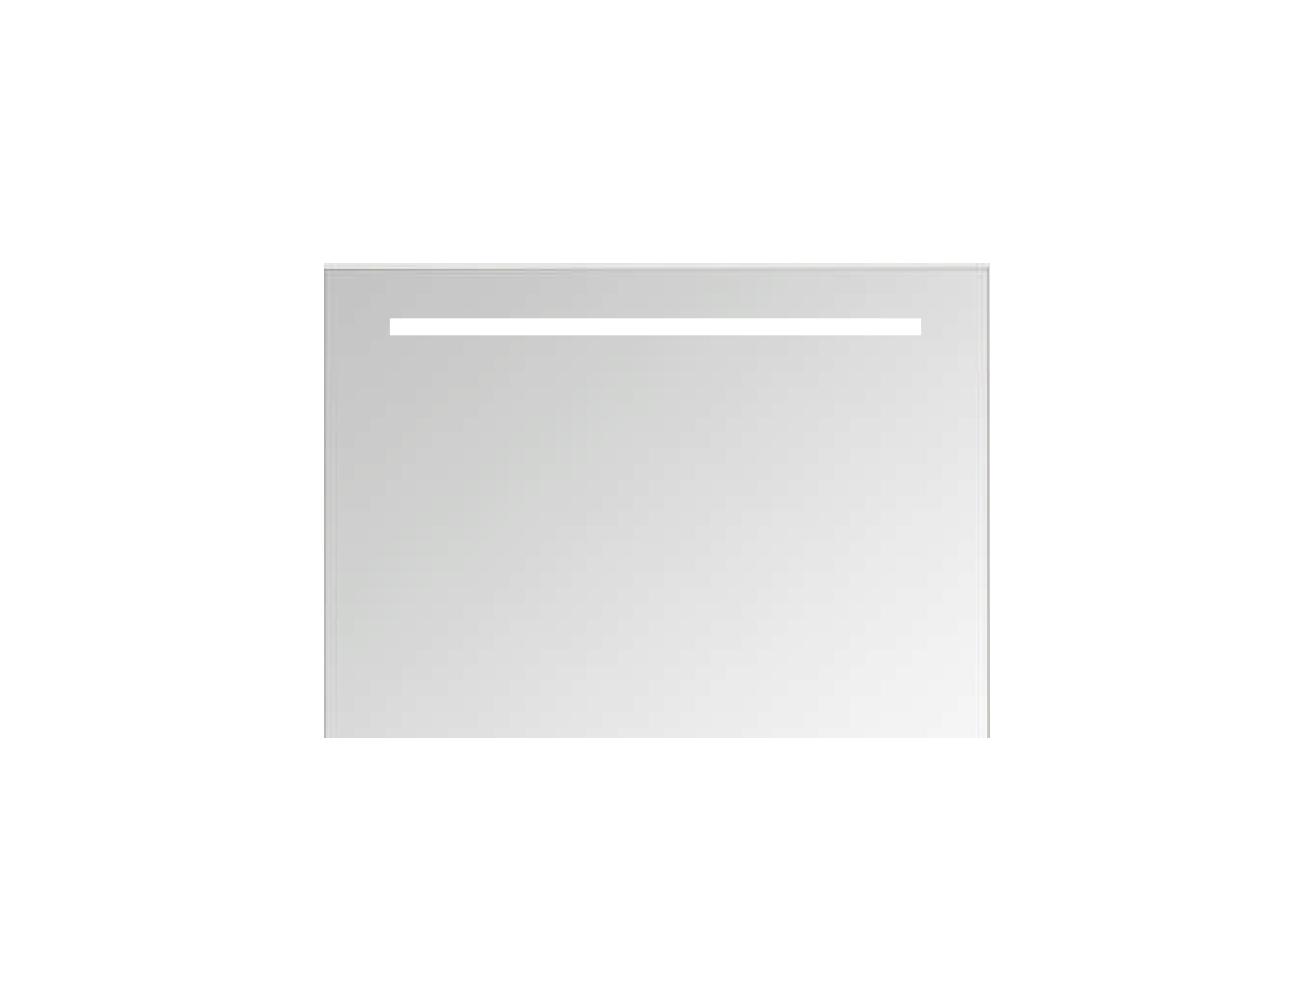 Basic spiegel op alu frame met geintegreerde led verlichting - 1000x30mm (bxd)